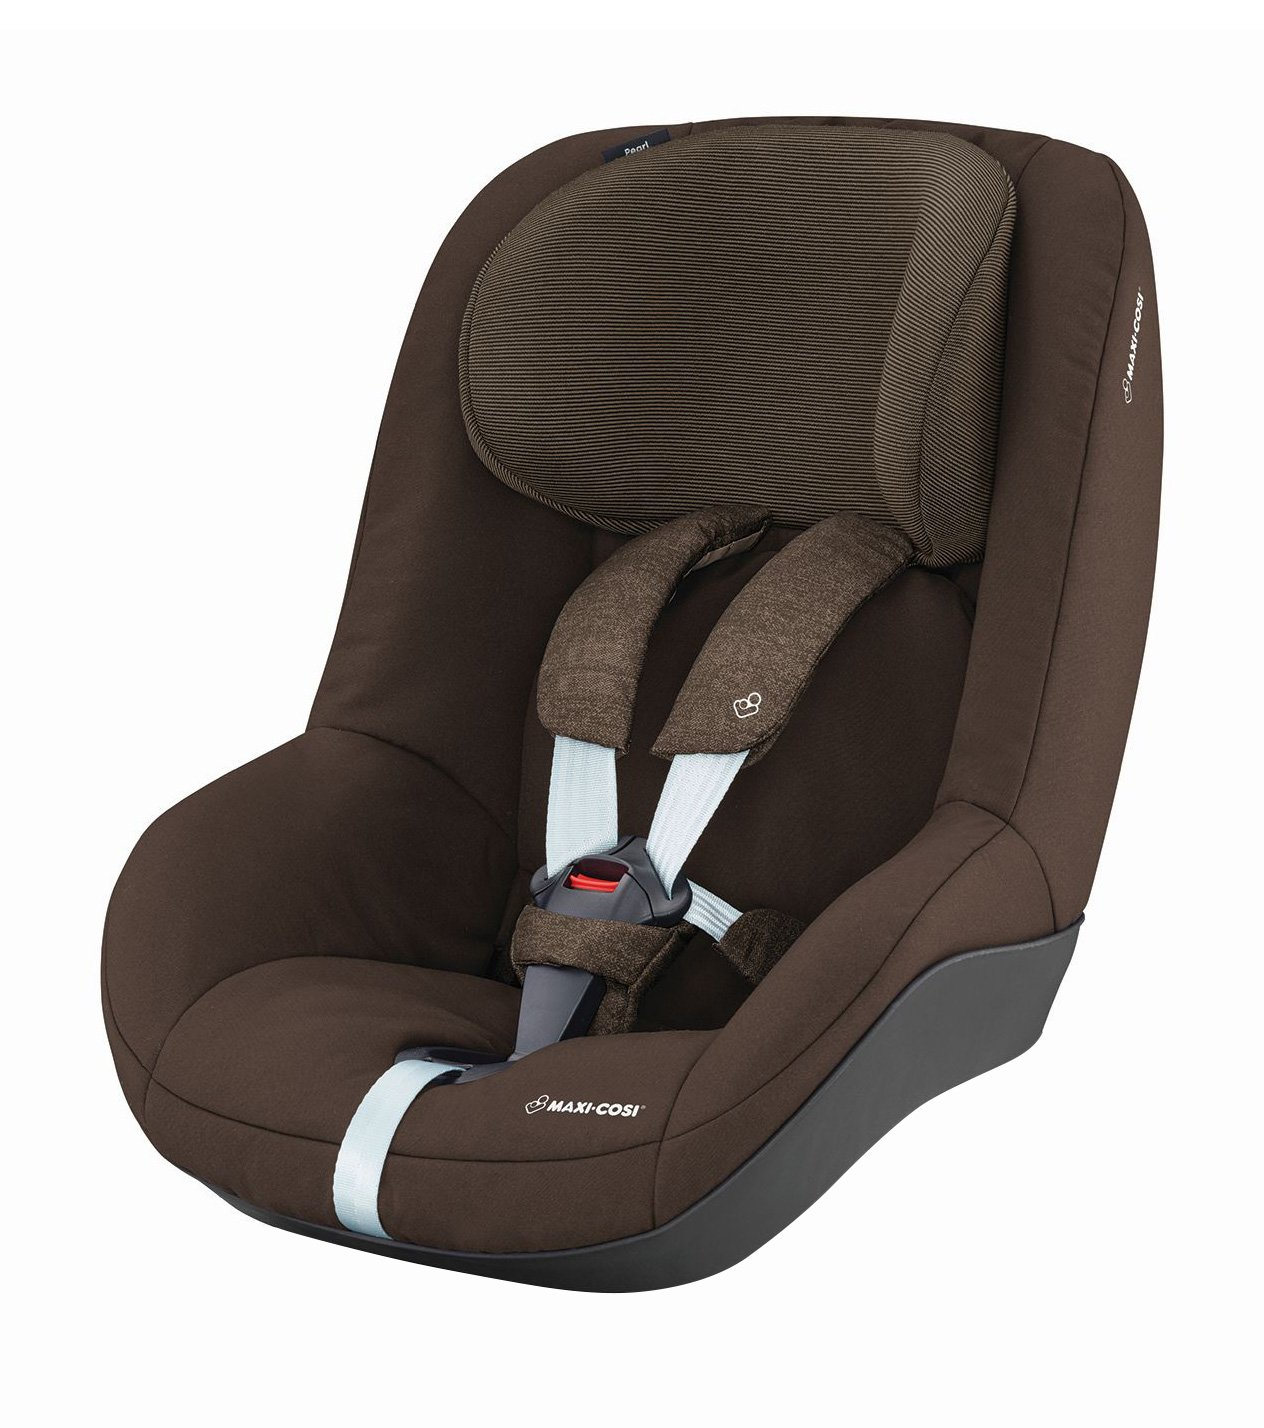 Bērnu autosēdeklis 9-18 kg MAXI-COSI Pearl Nomad Brown